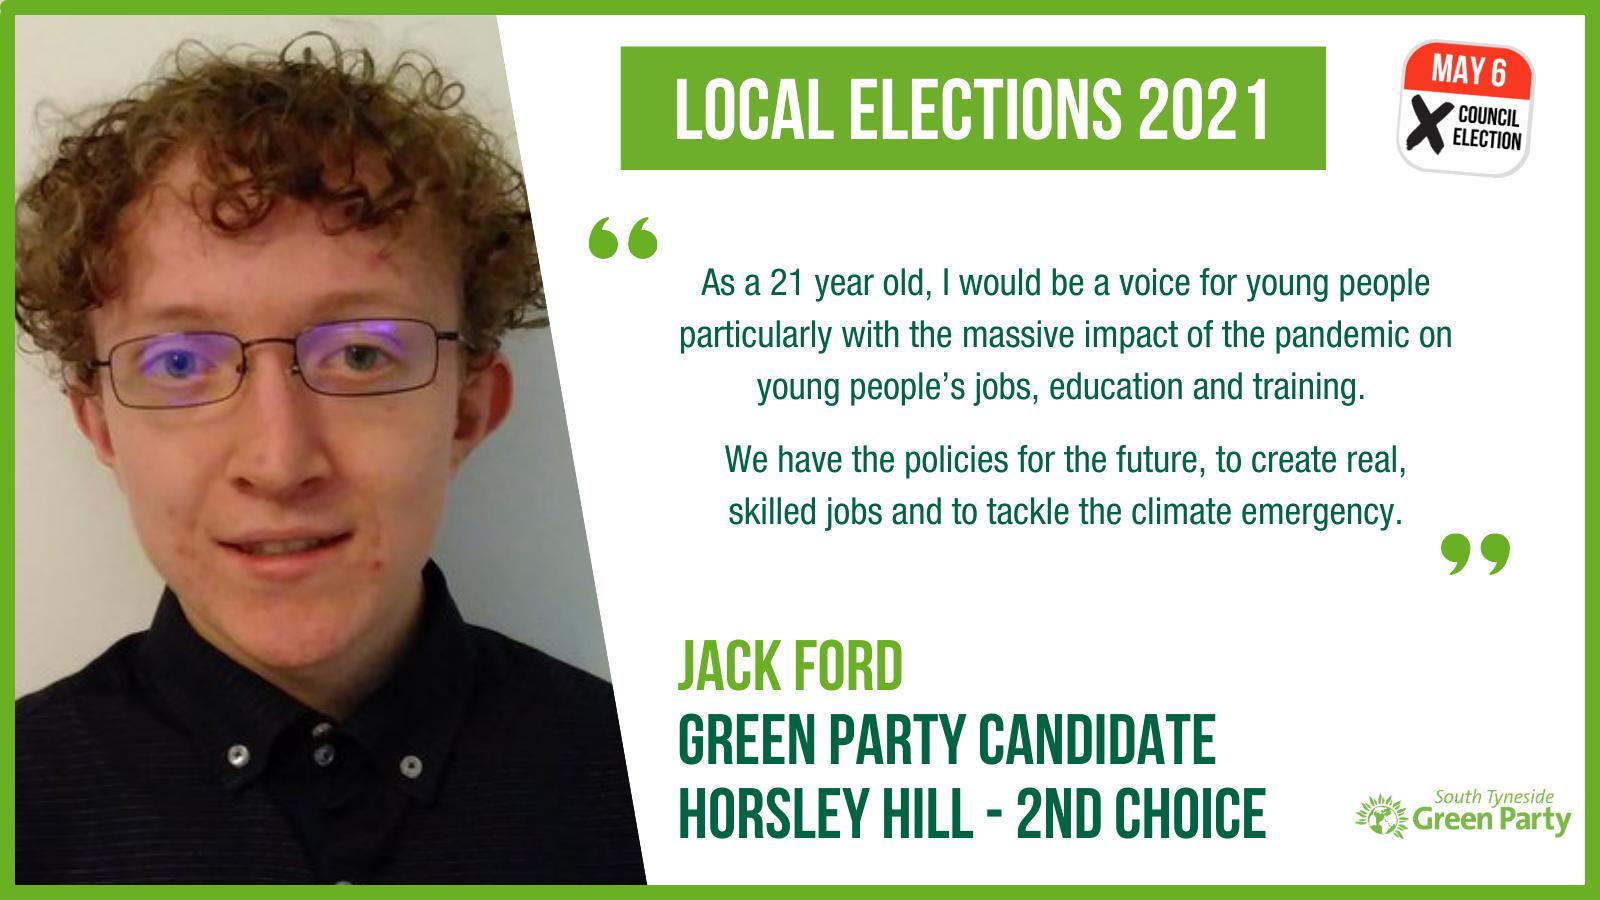 Horsley Hill - second choice